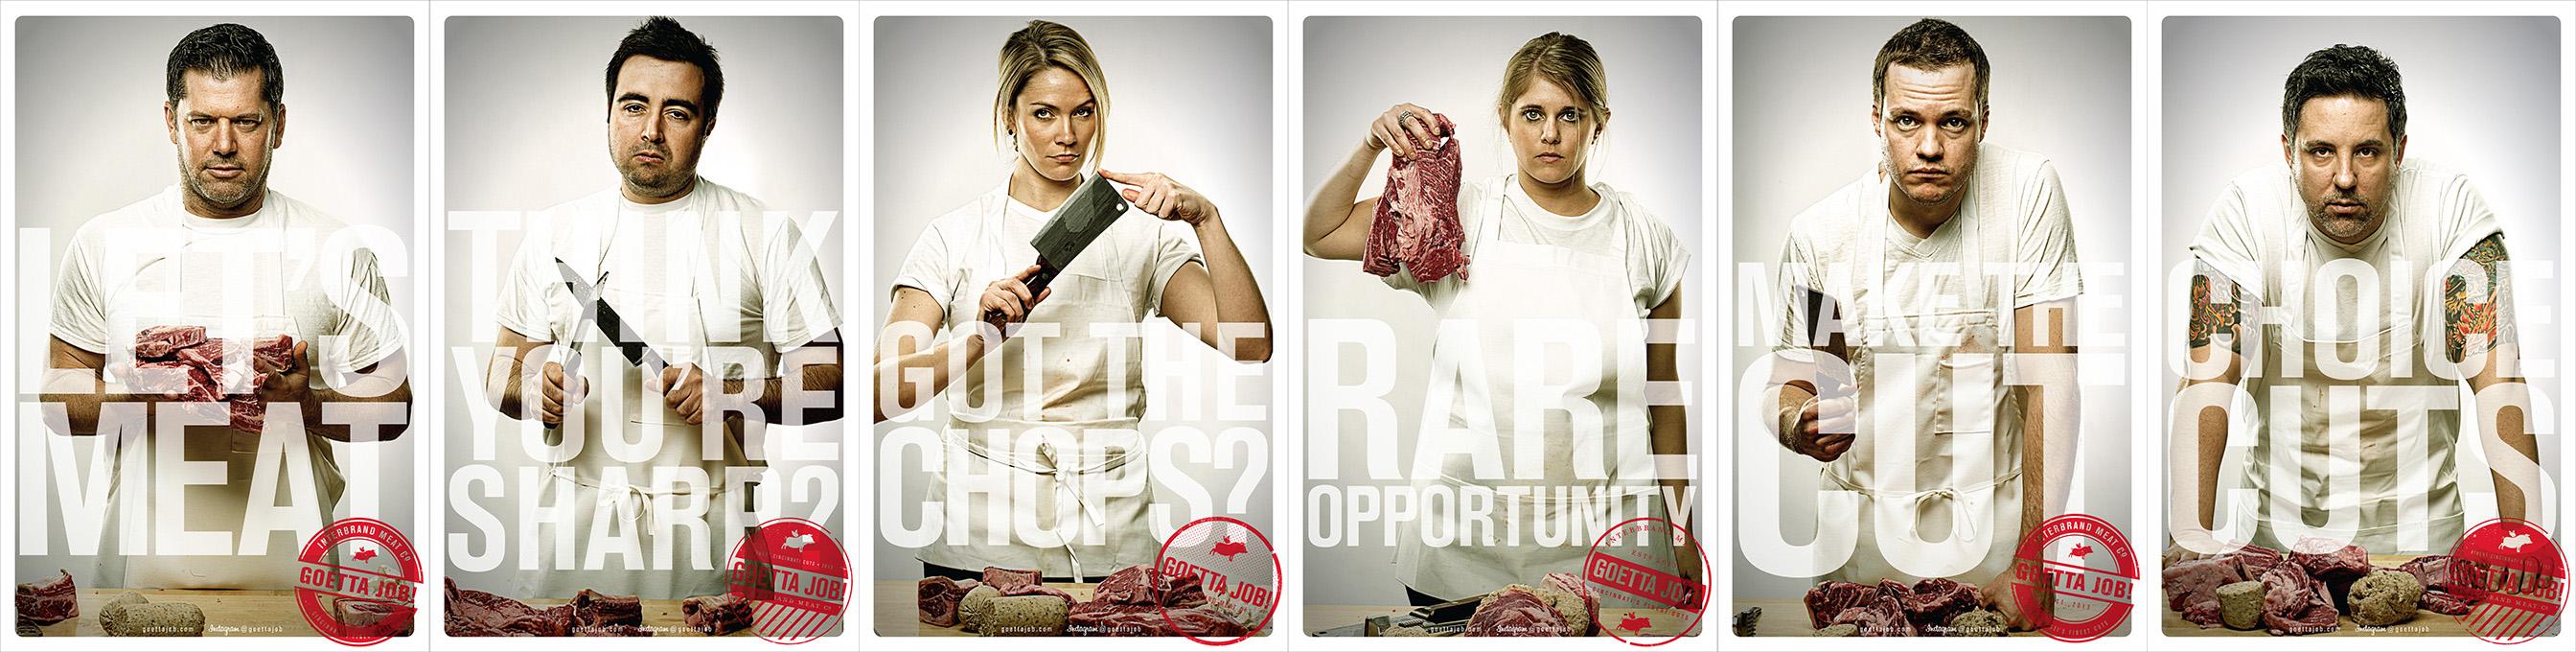 Goetta Job! (Recruiting Fresh Meat)